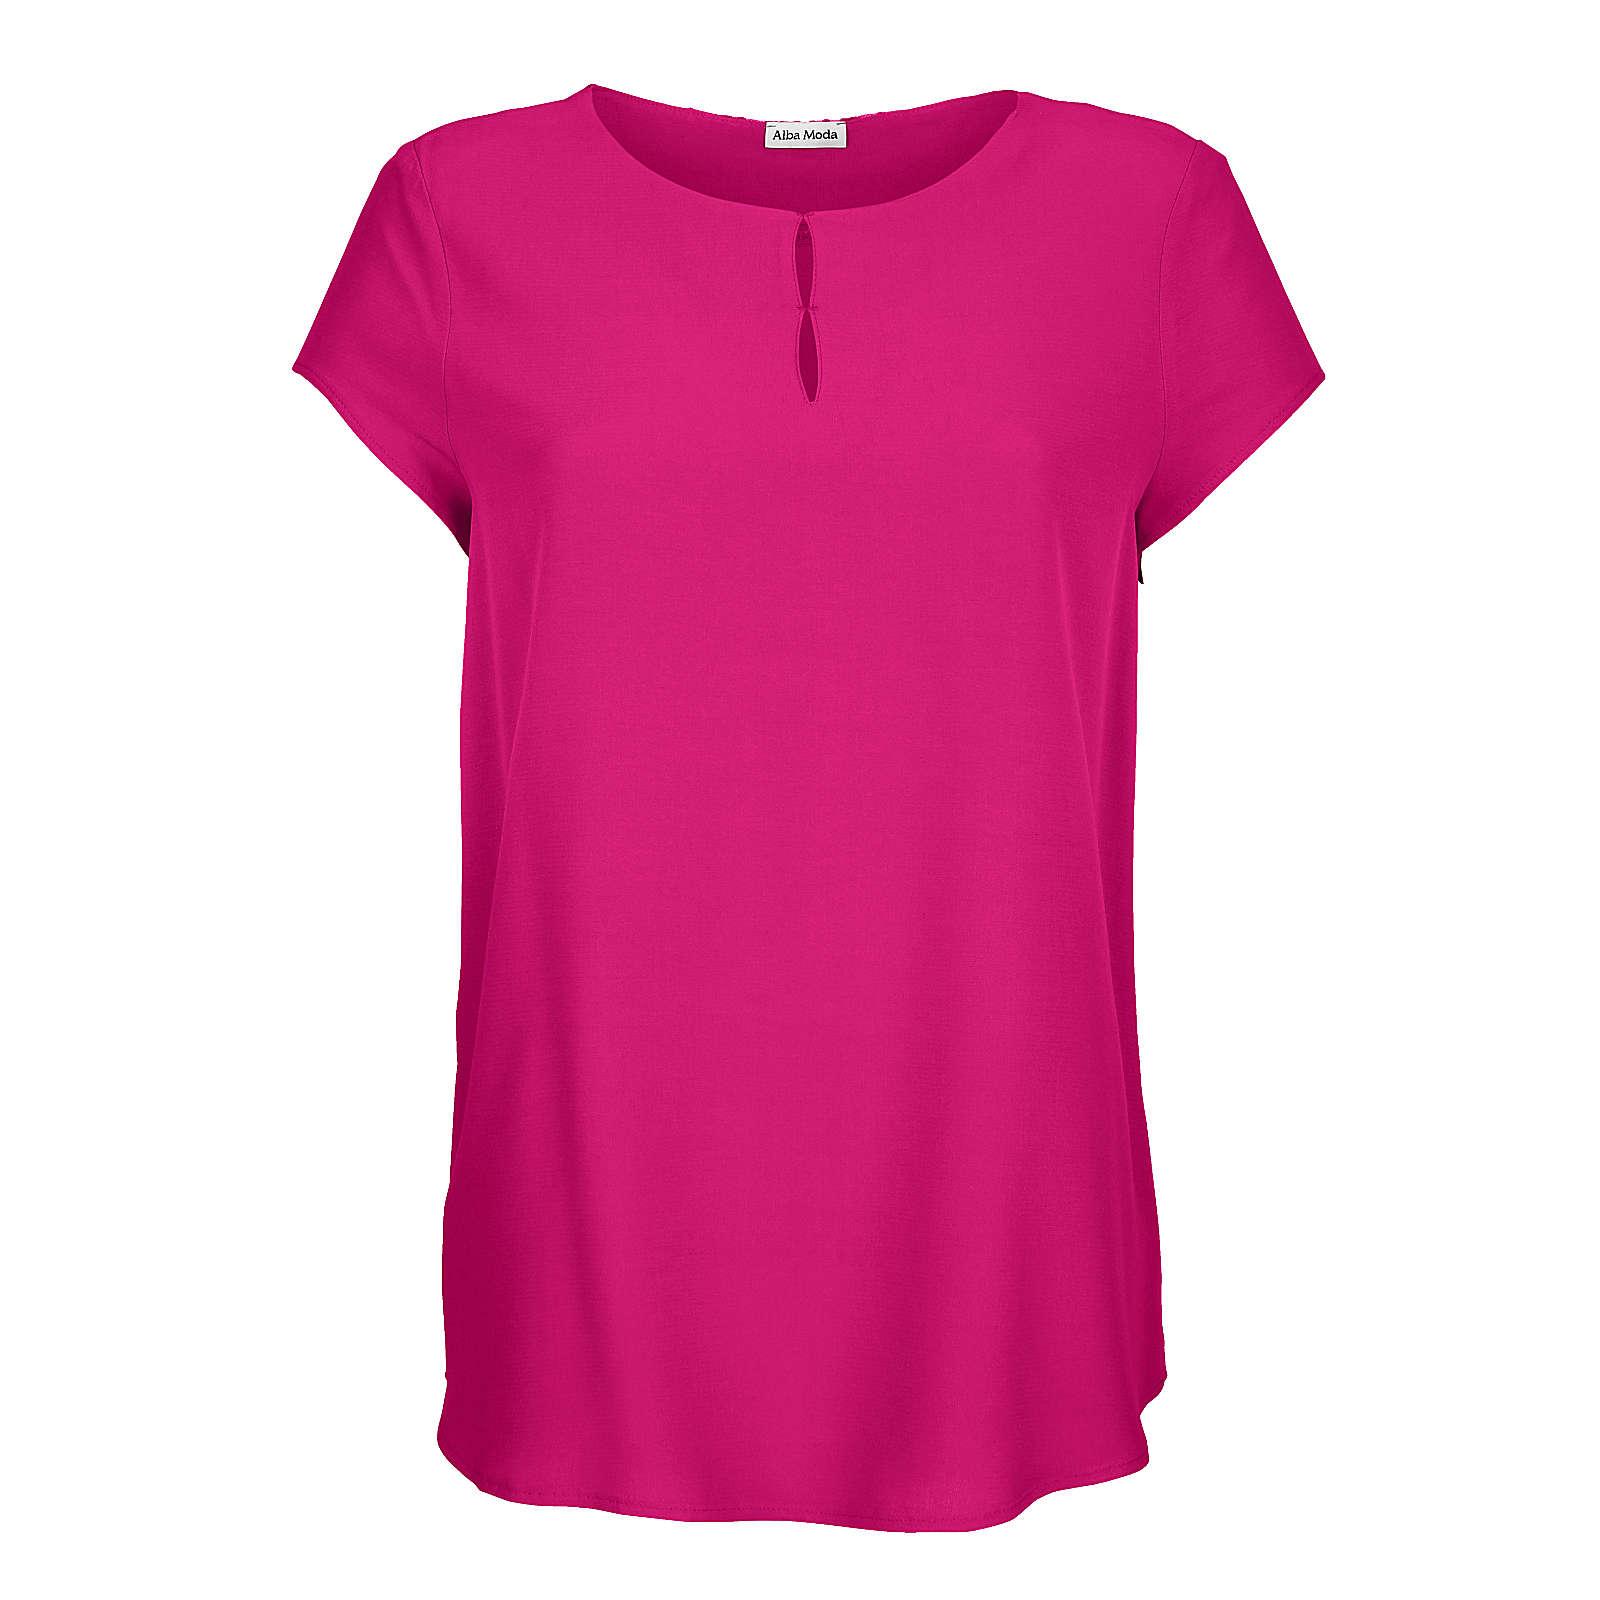 Alba Moda Bluse pink Damen Gr. 38